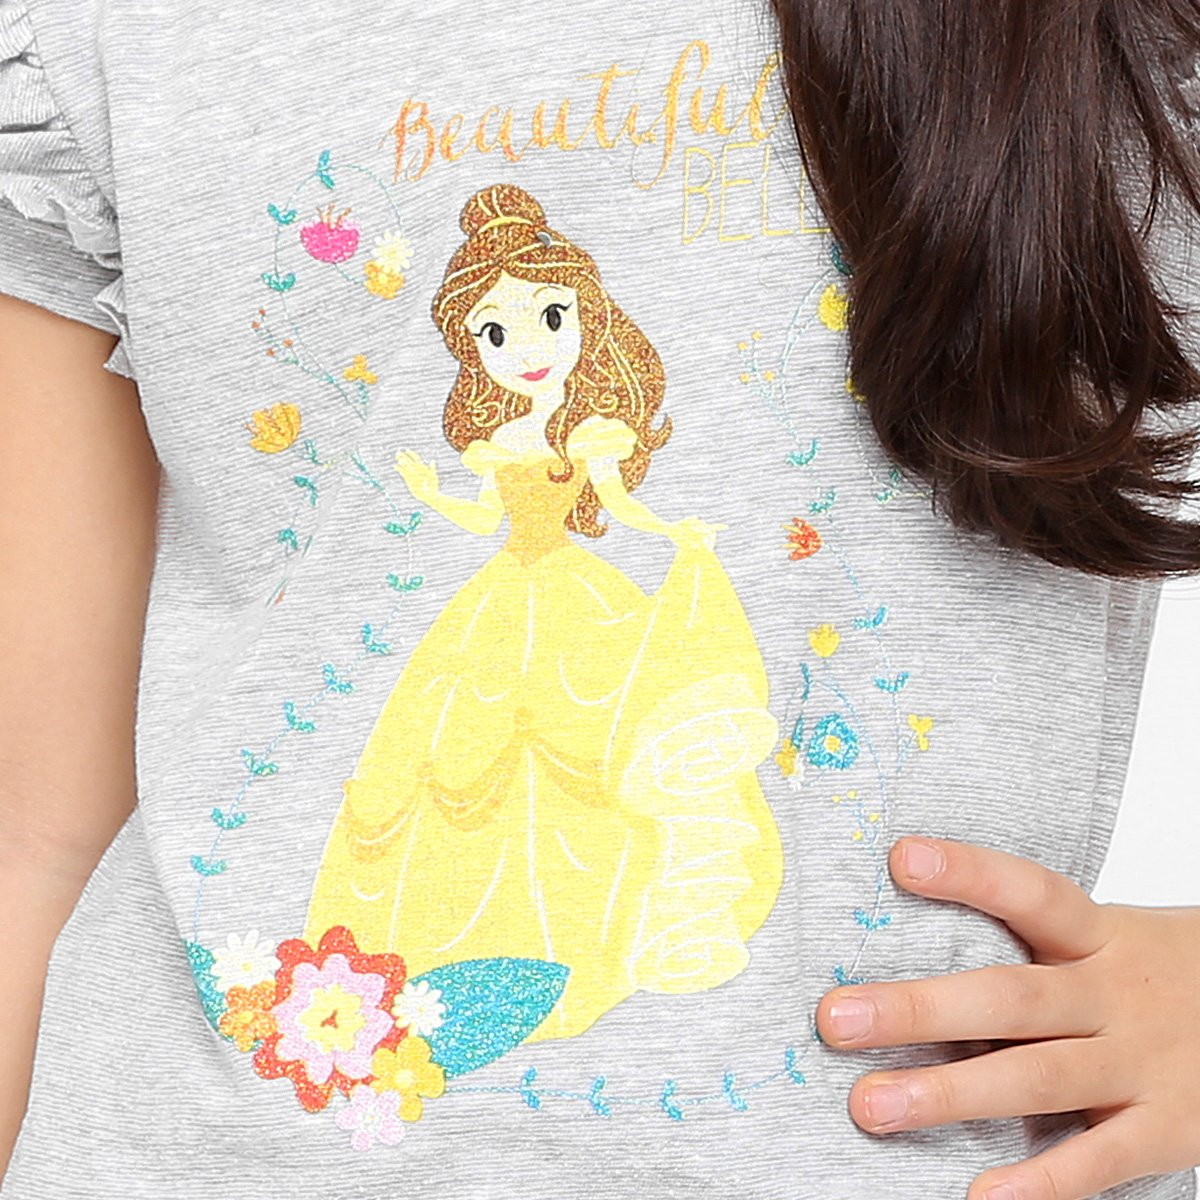 Mescla Camiseta Camiseta Disney Mescla Disney Infantil Bela Disney Camiseta Bela Infantil 6TPxxw